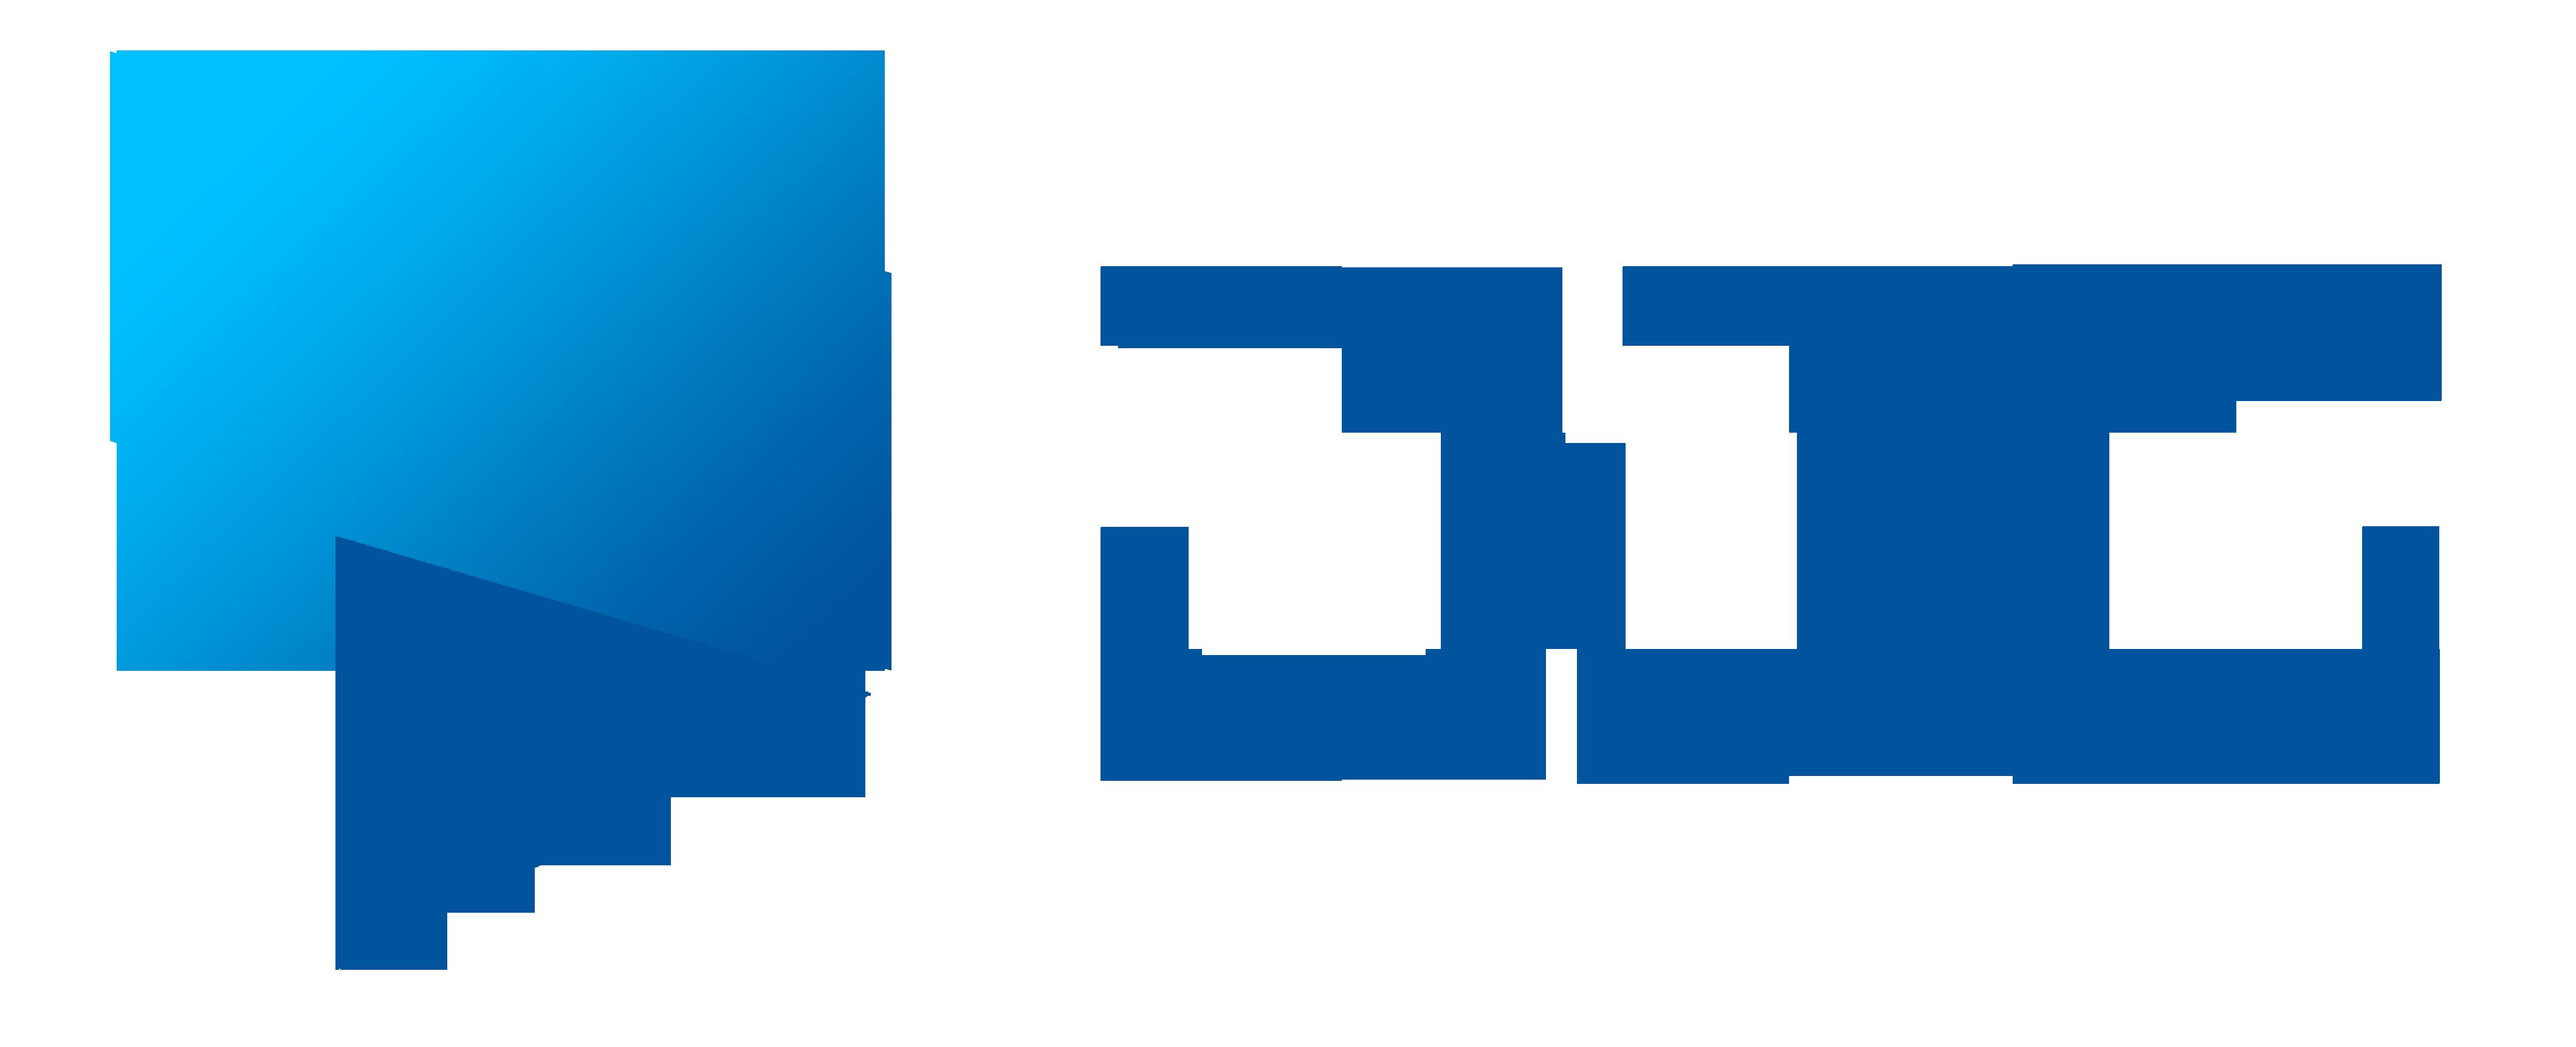 DJG launches eStore with a range of self-serve digital content marketing services